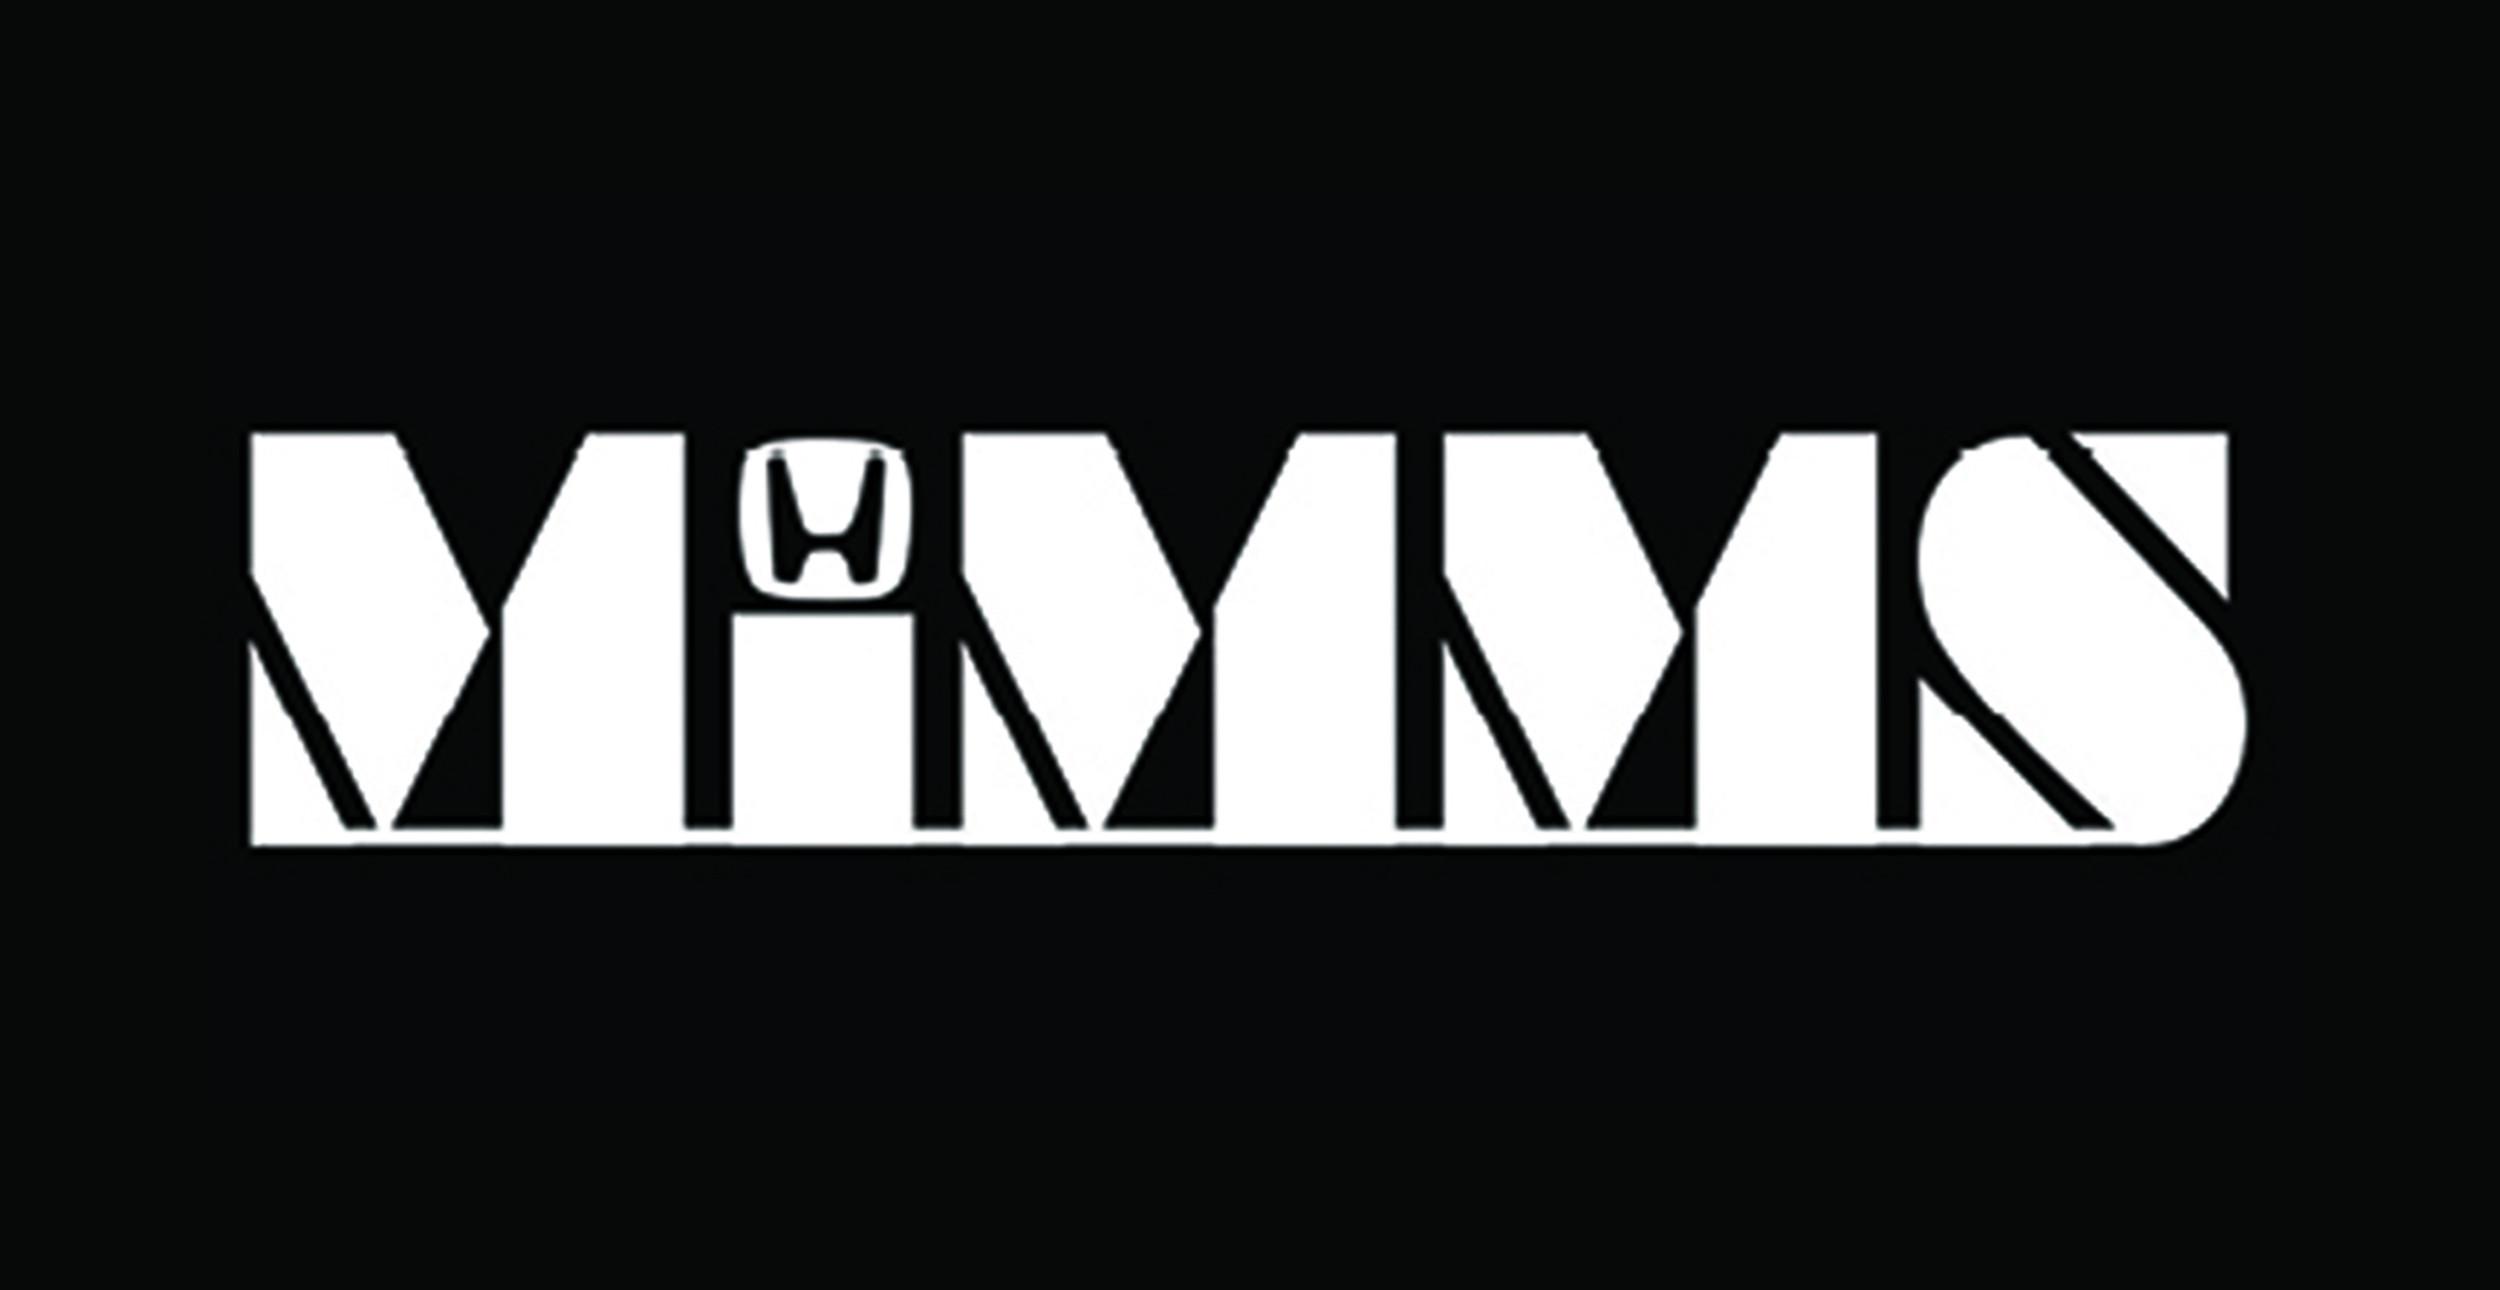 www.mimmshondaday.com